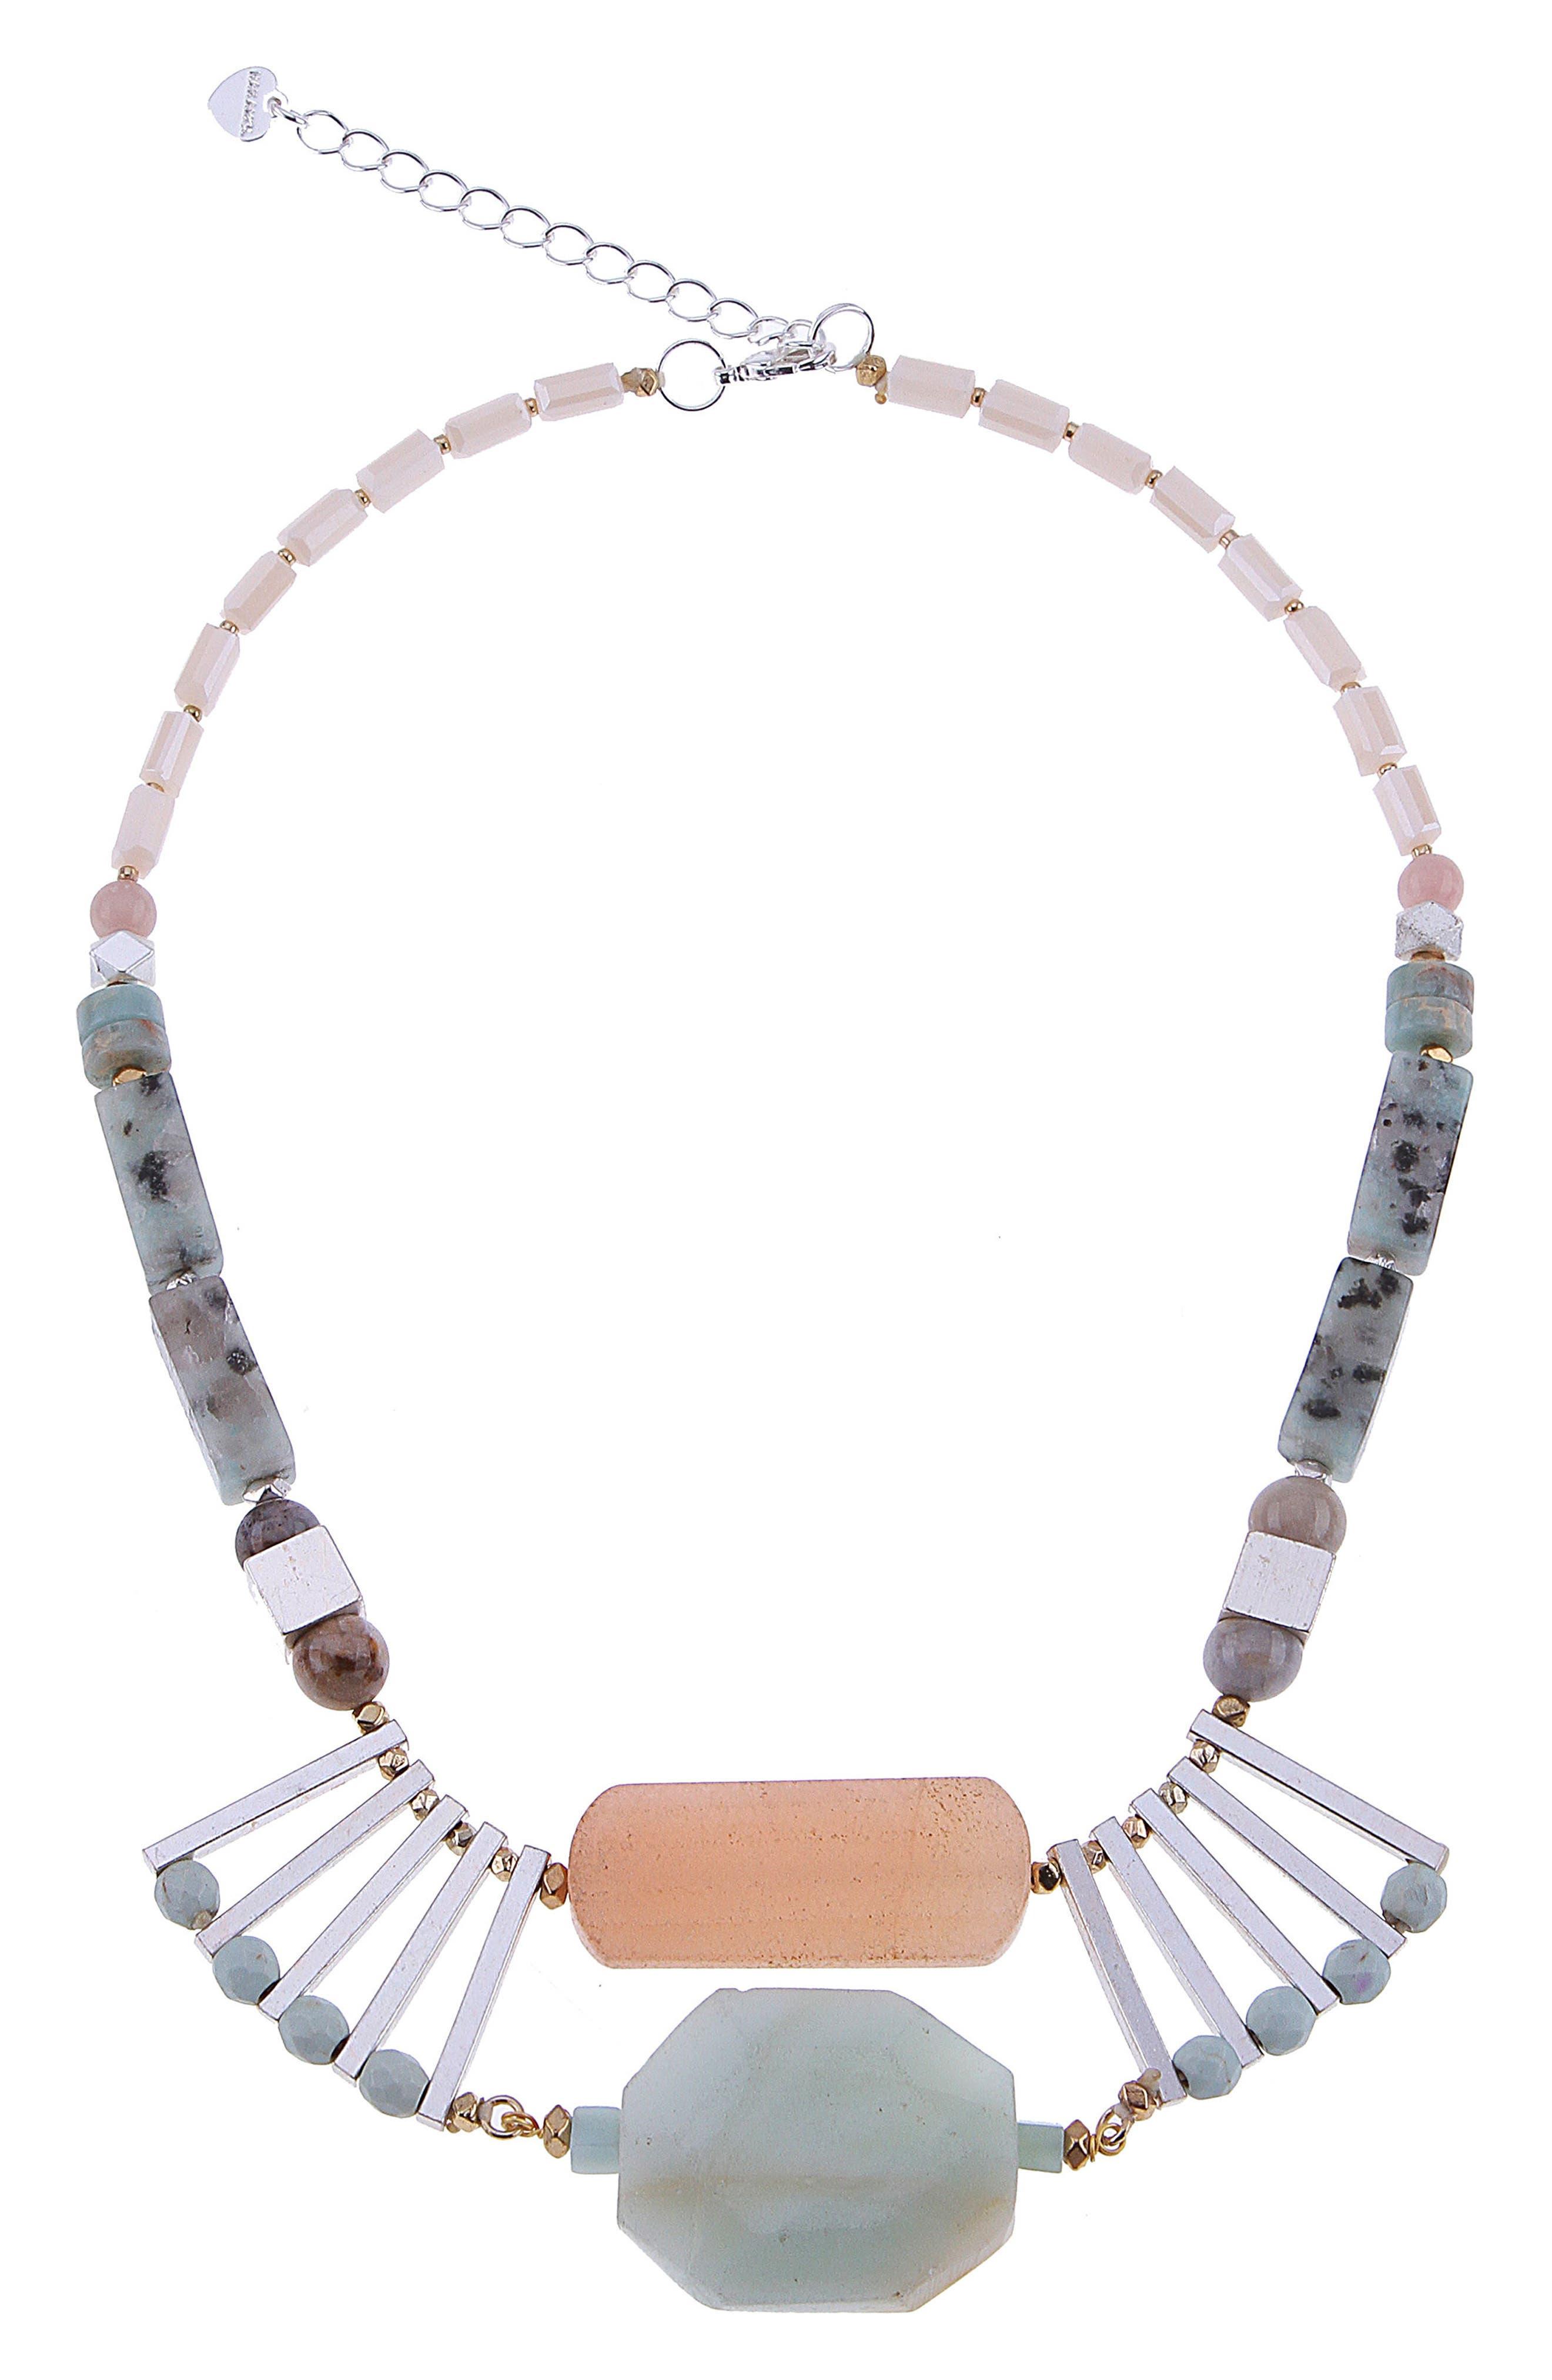 Agate & Amazonite Chunk Stone Statement Necklace,                         Main,                         color, Aqua